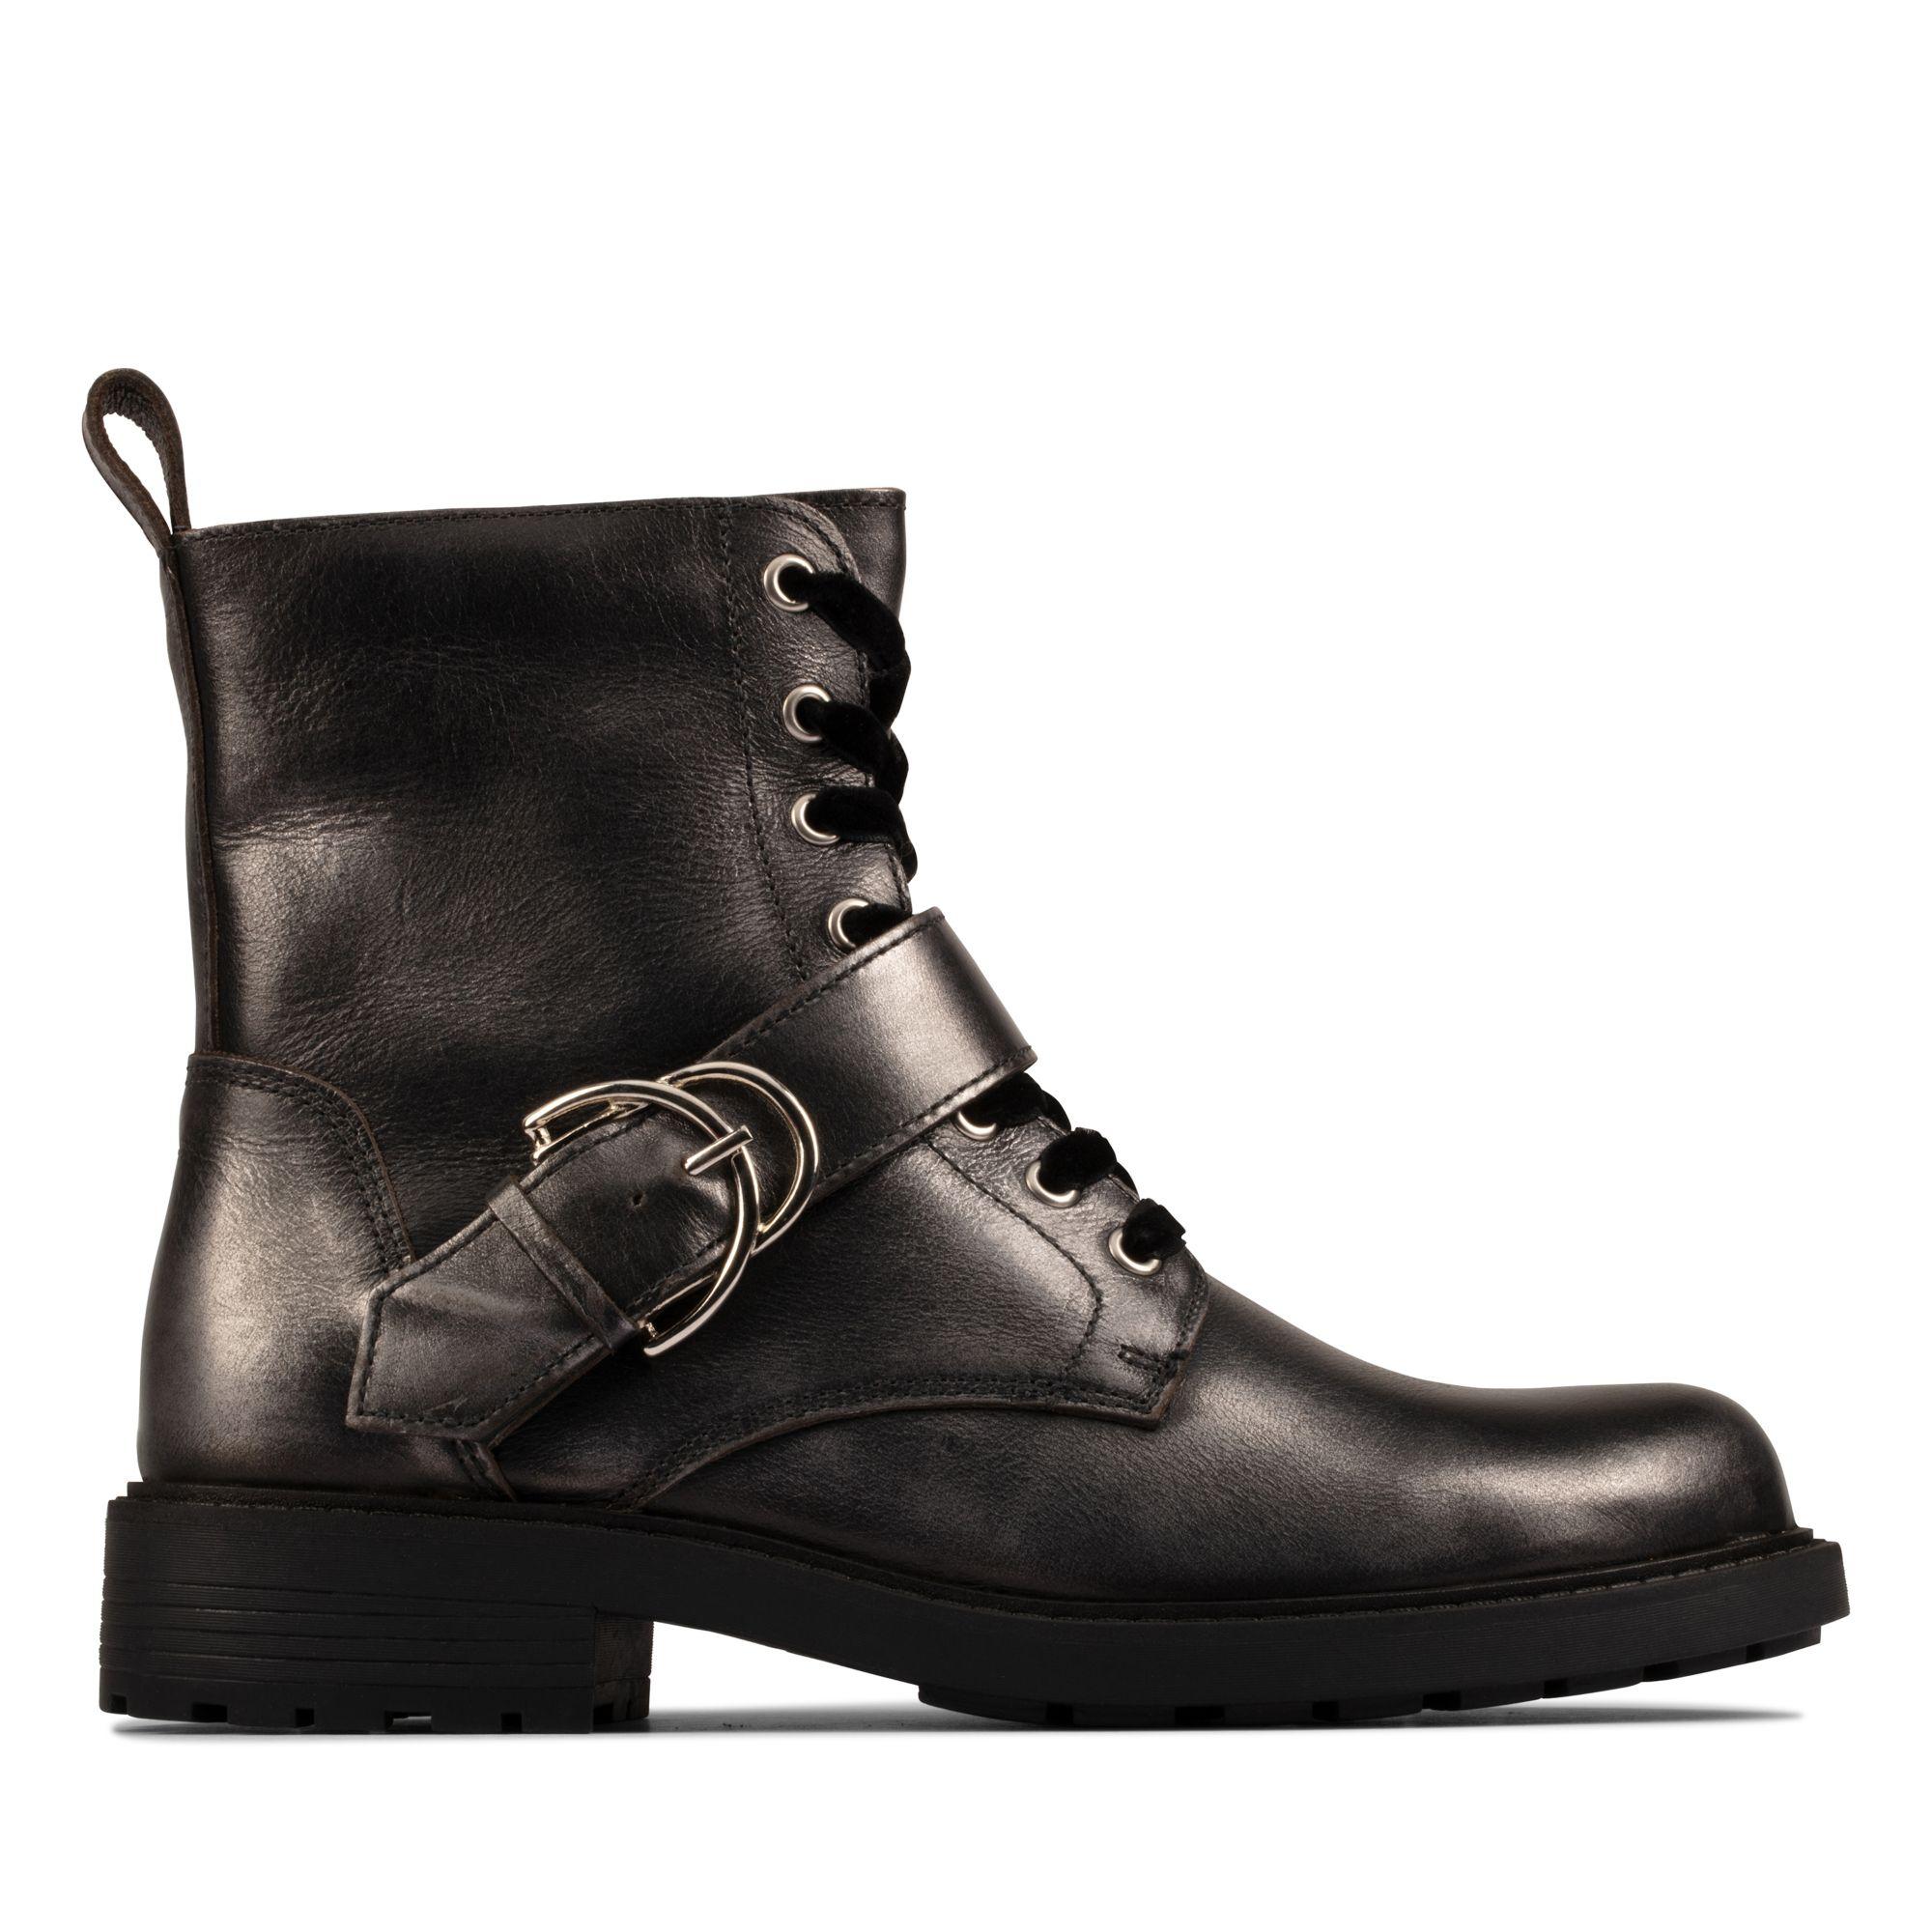 Clarks Orinoco 2 Buckle – Leather